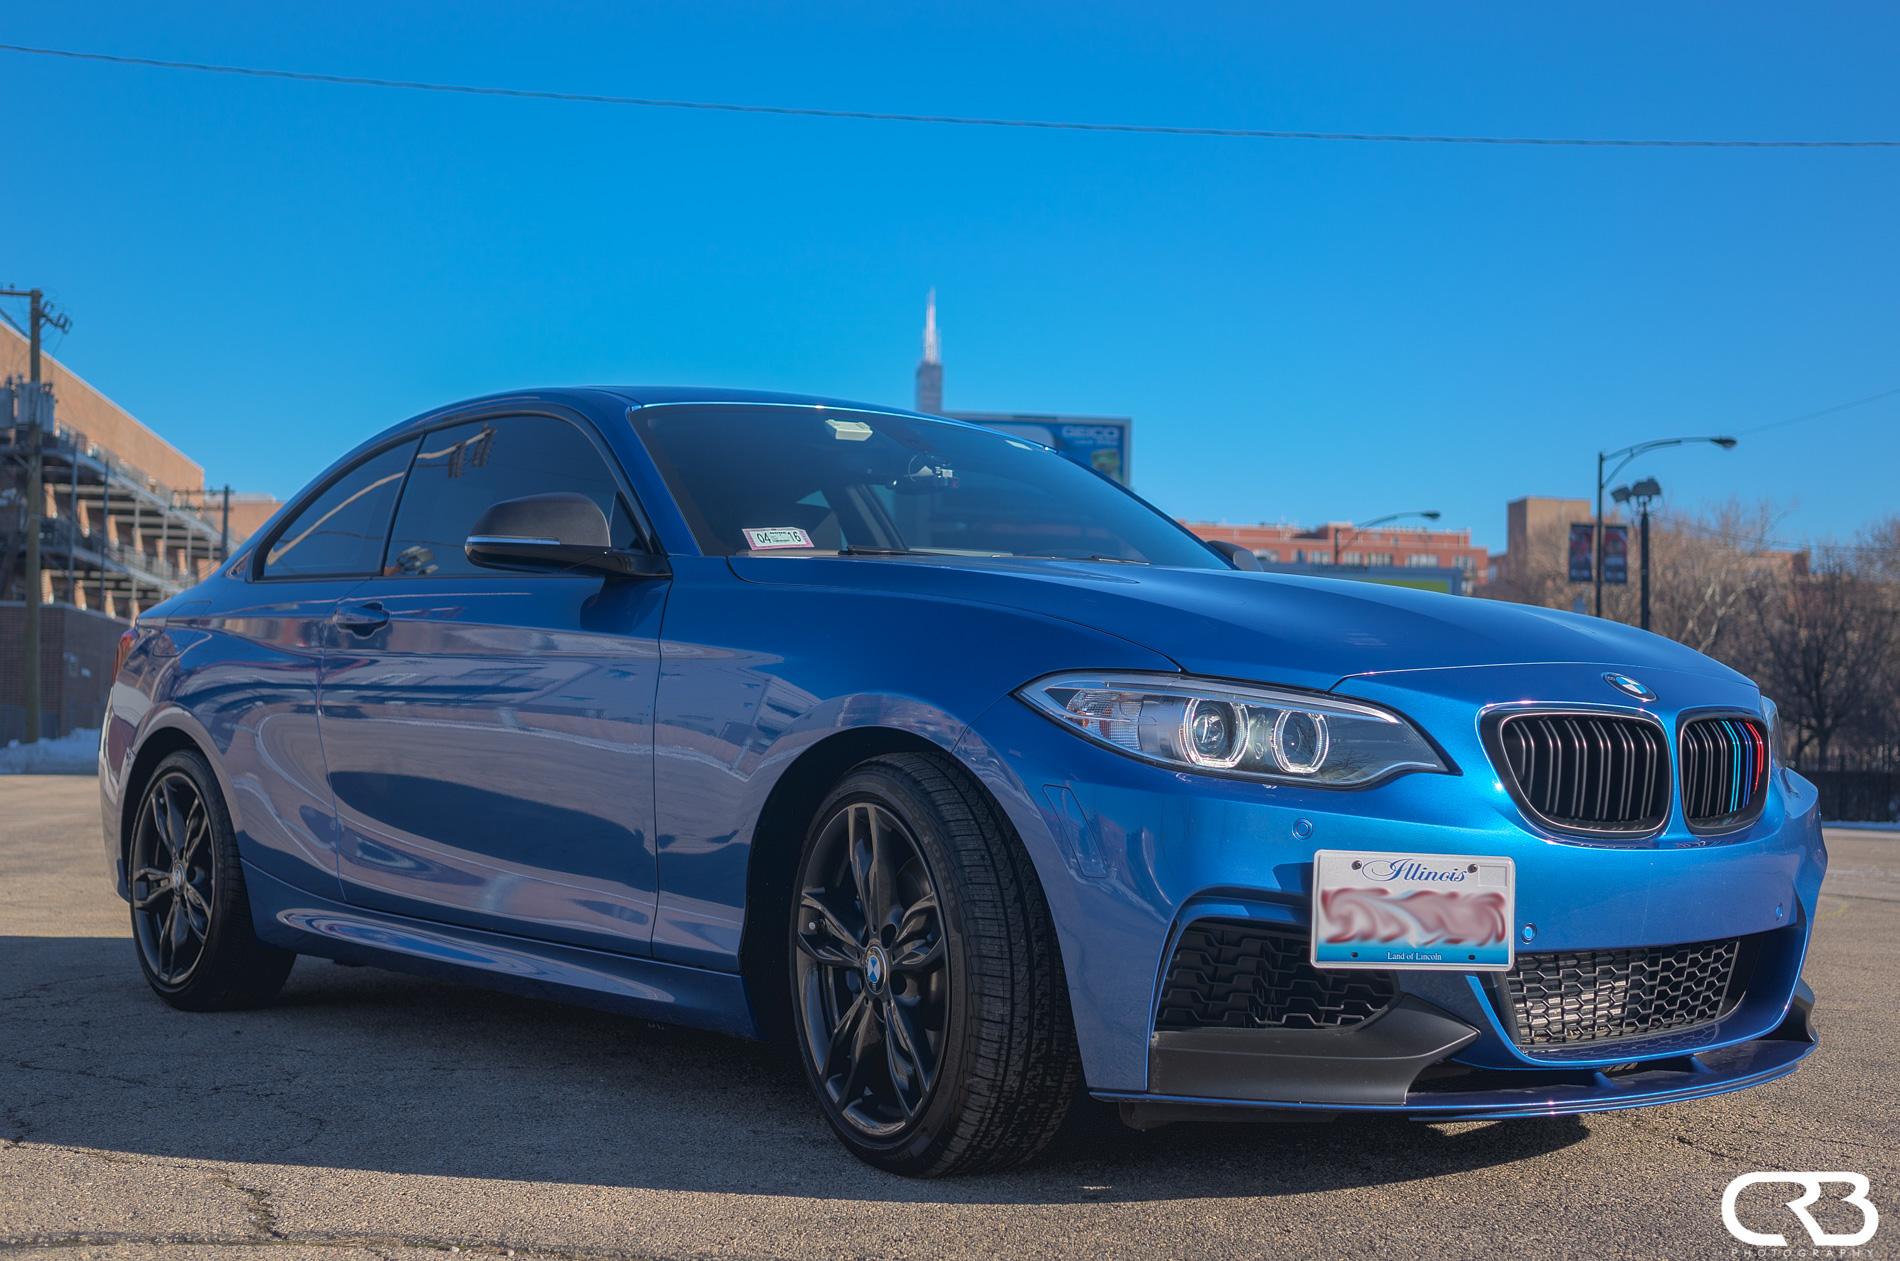 Name:  BMW_HDR_1.jpg Views: 5339 Size:  718.6 KB